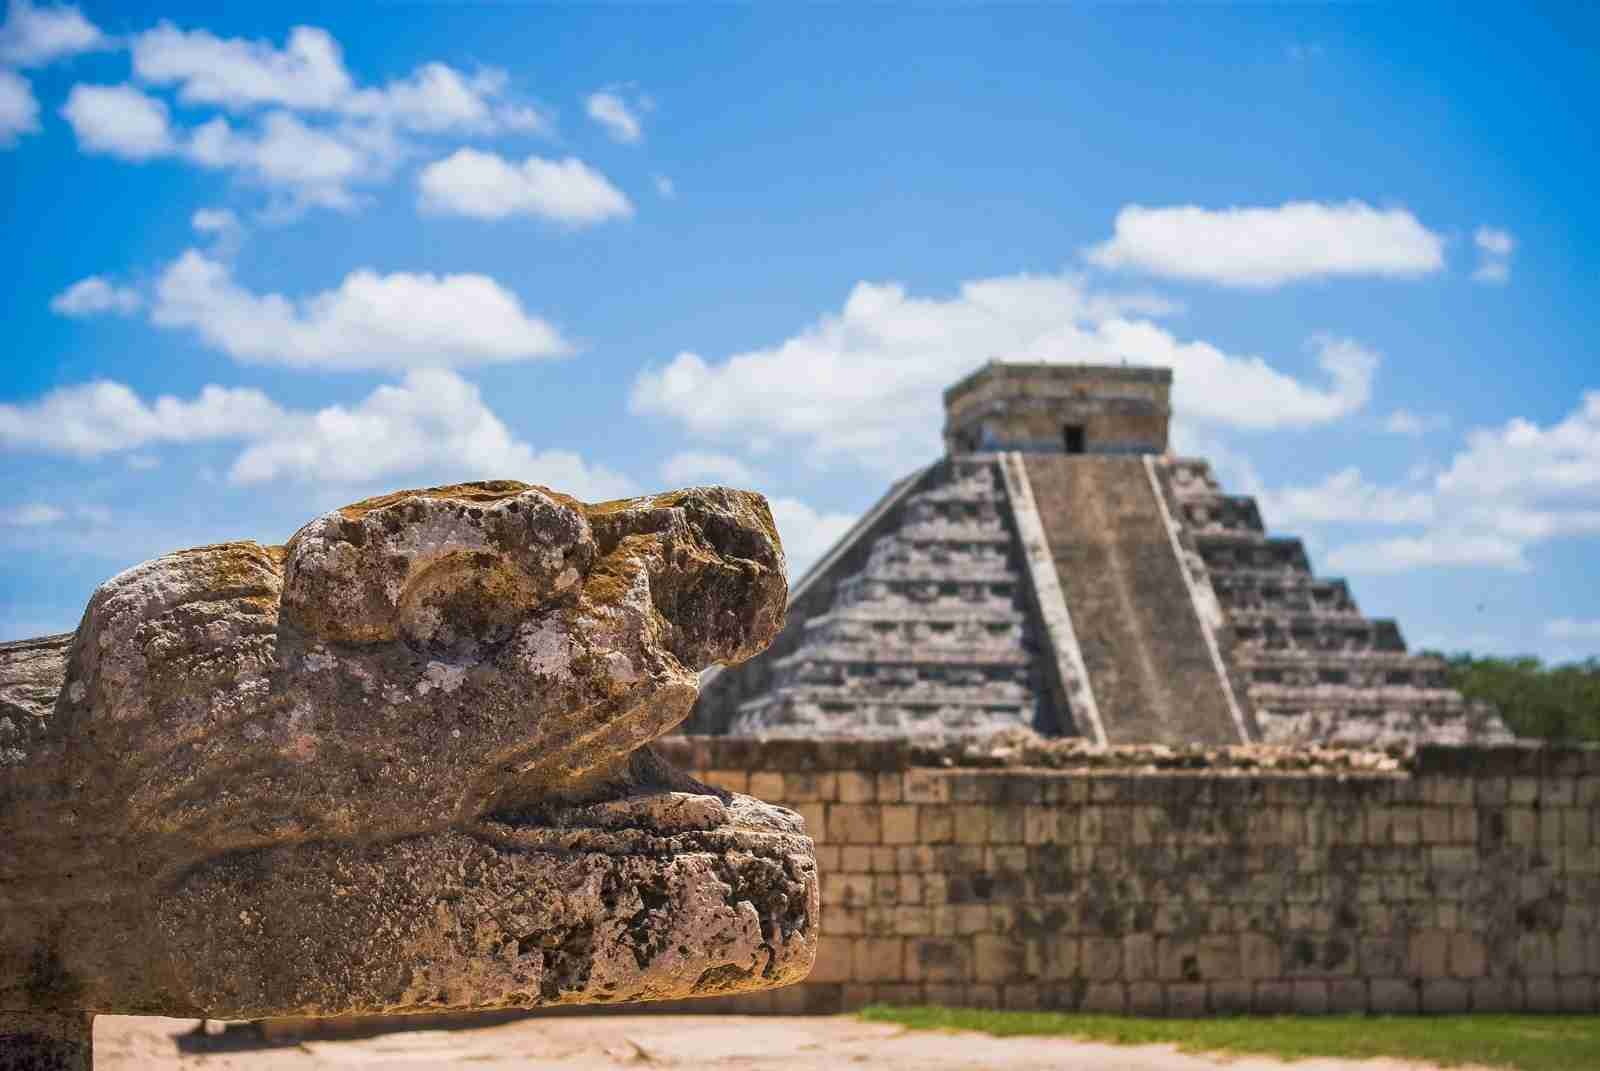 Chichén Itzá on the Yucatan Peninsula. (Photo by Marv Watson / Unsplash)